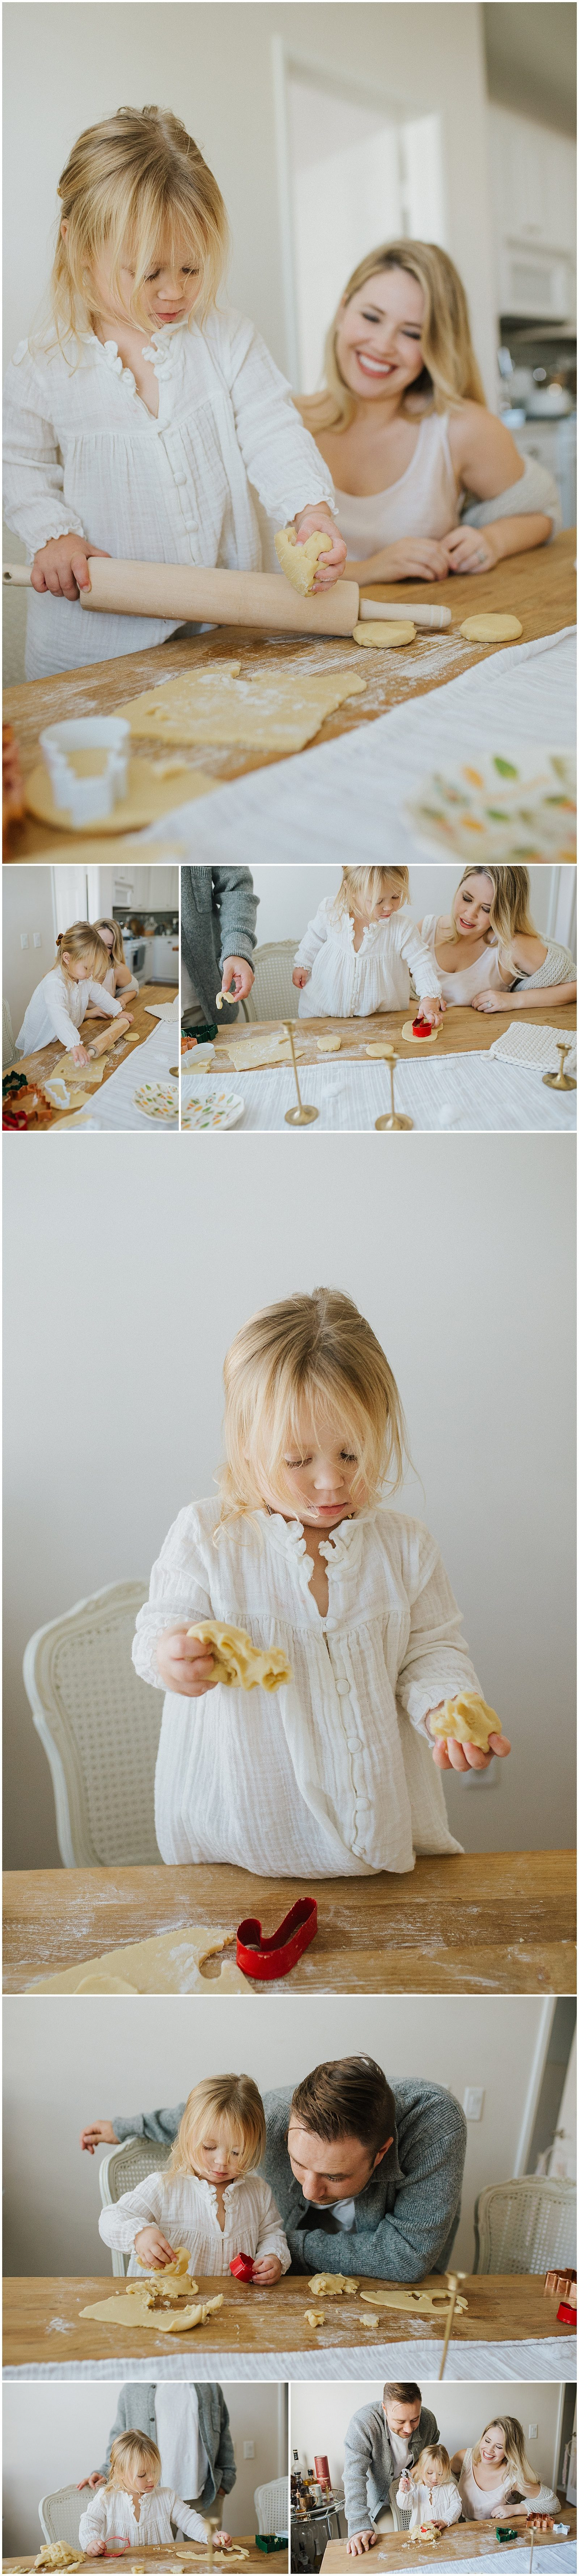 Orange County Family Lifestyle Photographer Sonja Hammad Photography 0126